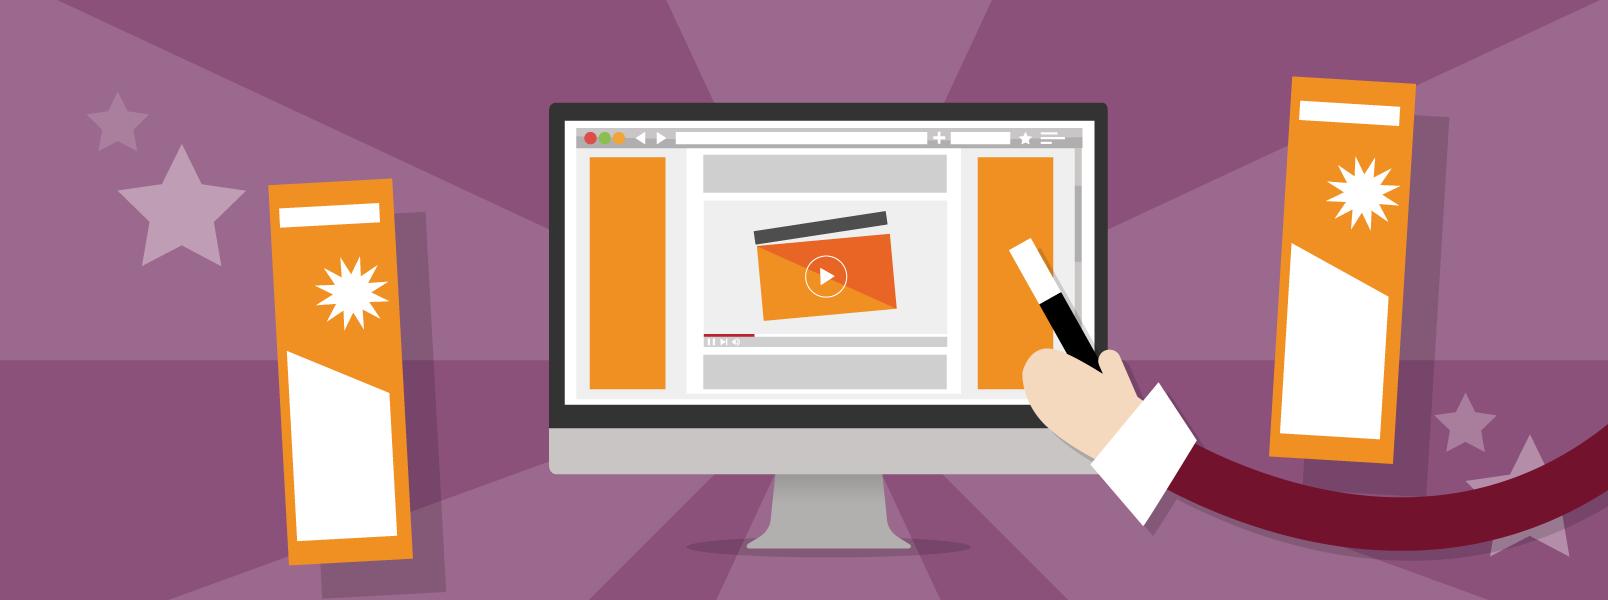 Jouw videomarketingcampagne - Banners